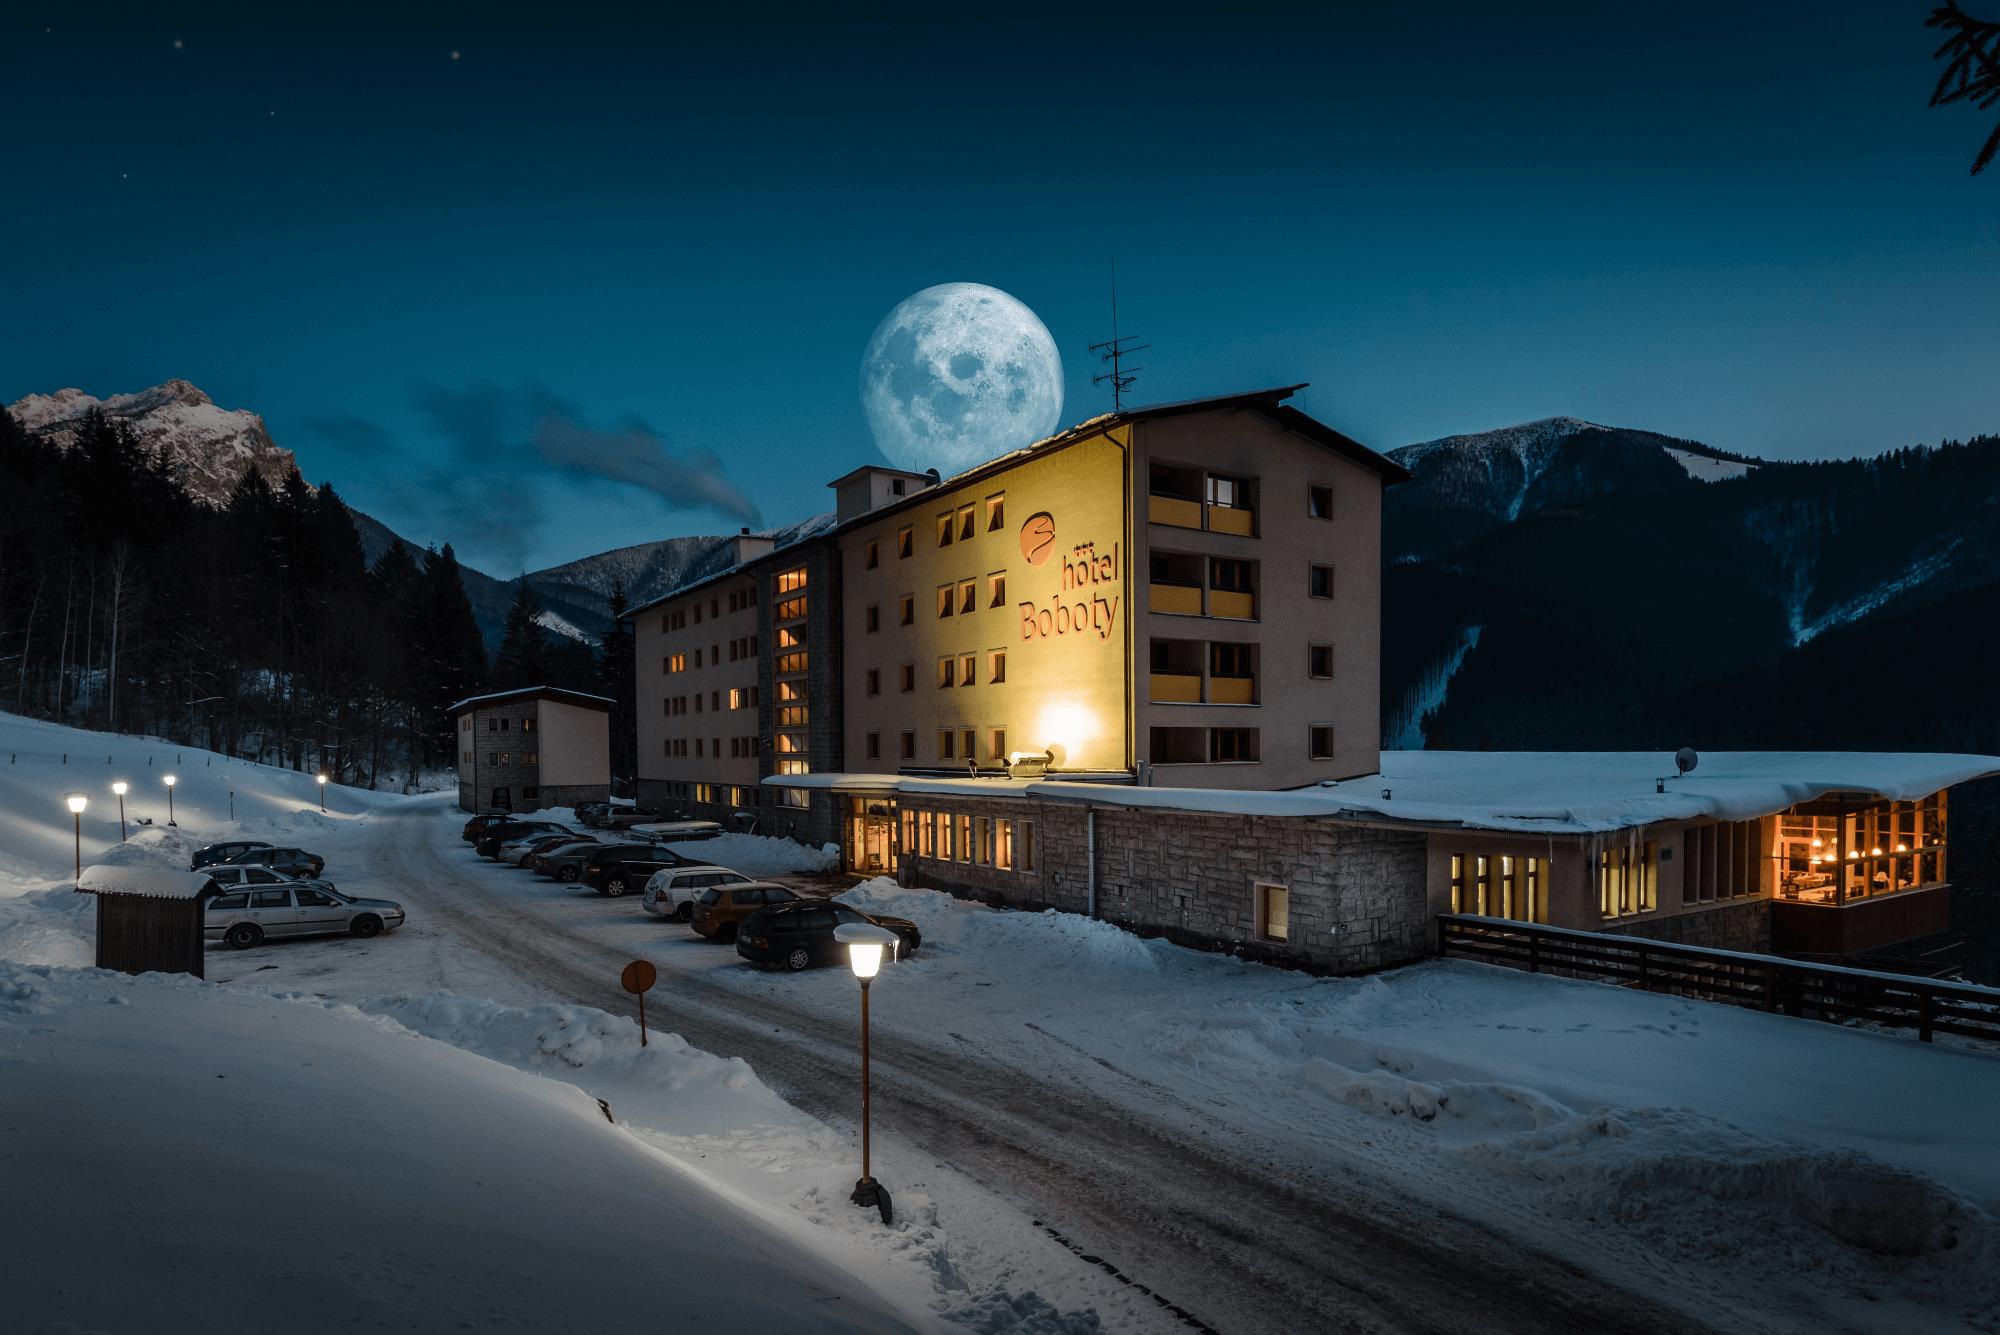 Zatvorenie hotela